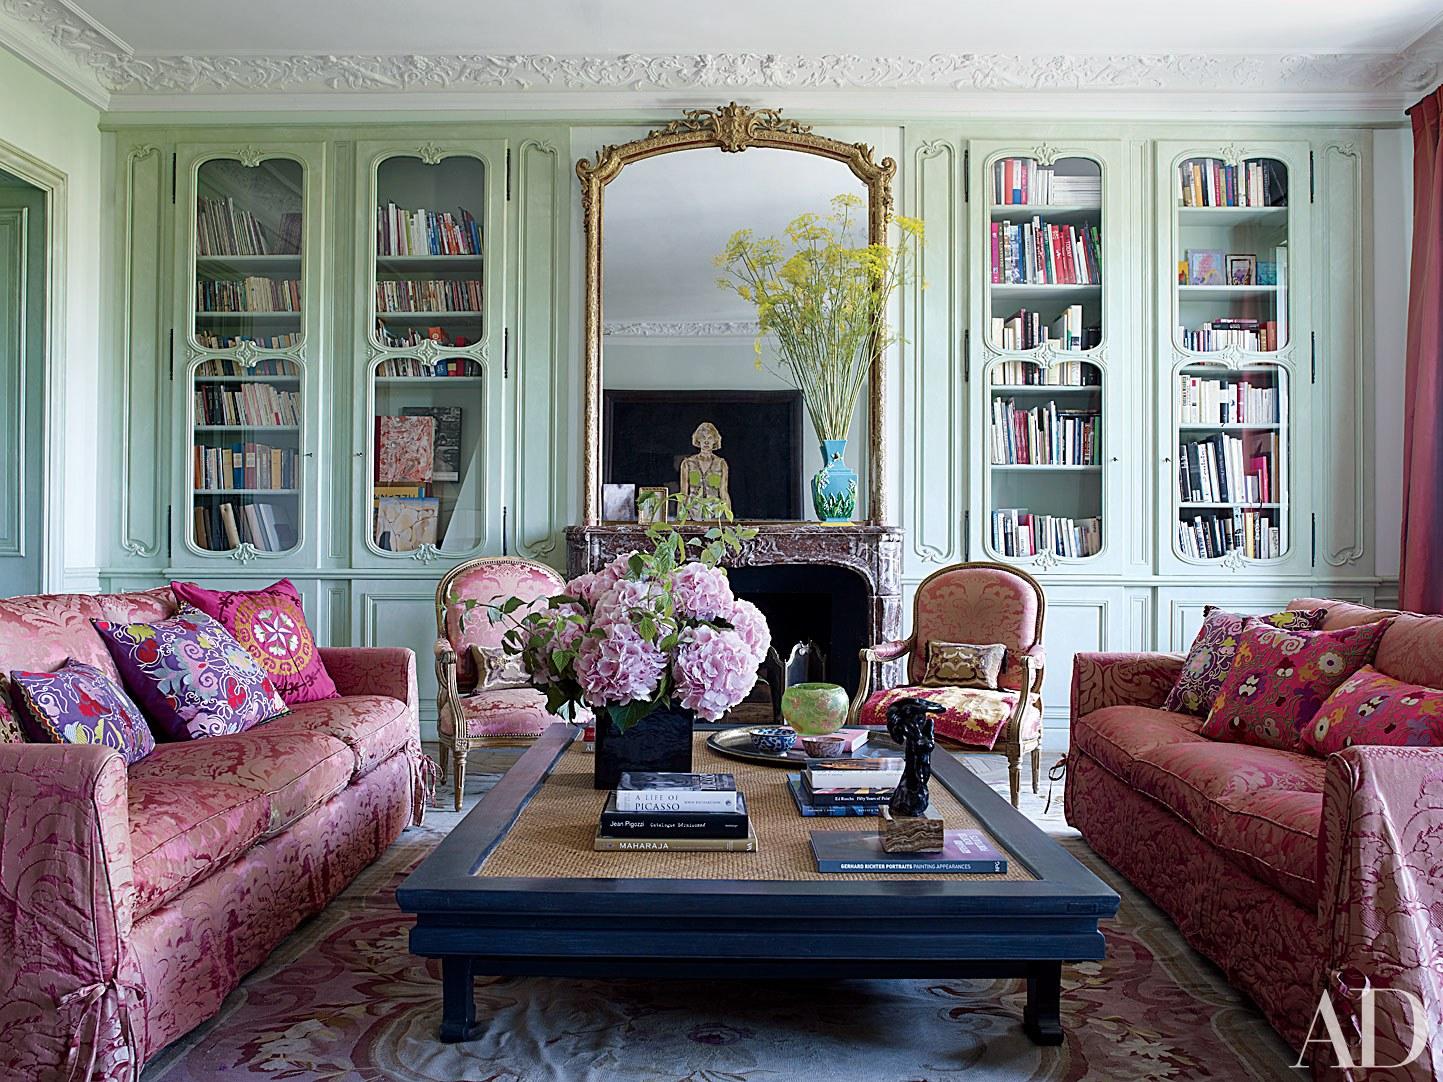 Home Decor for Bachelors and Bachelorettes